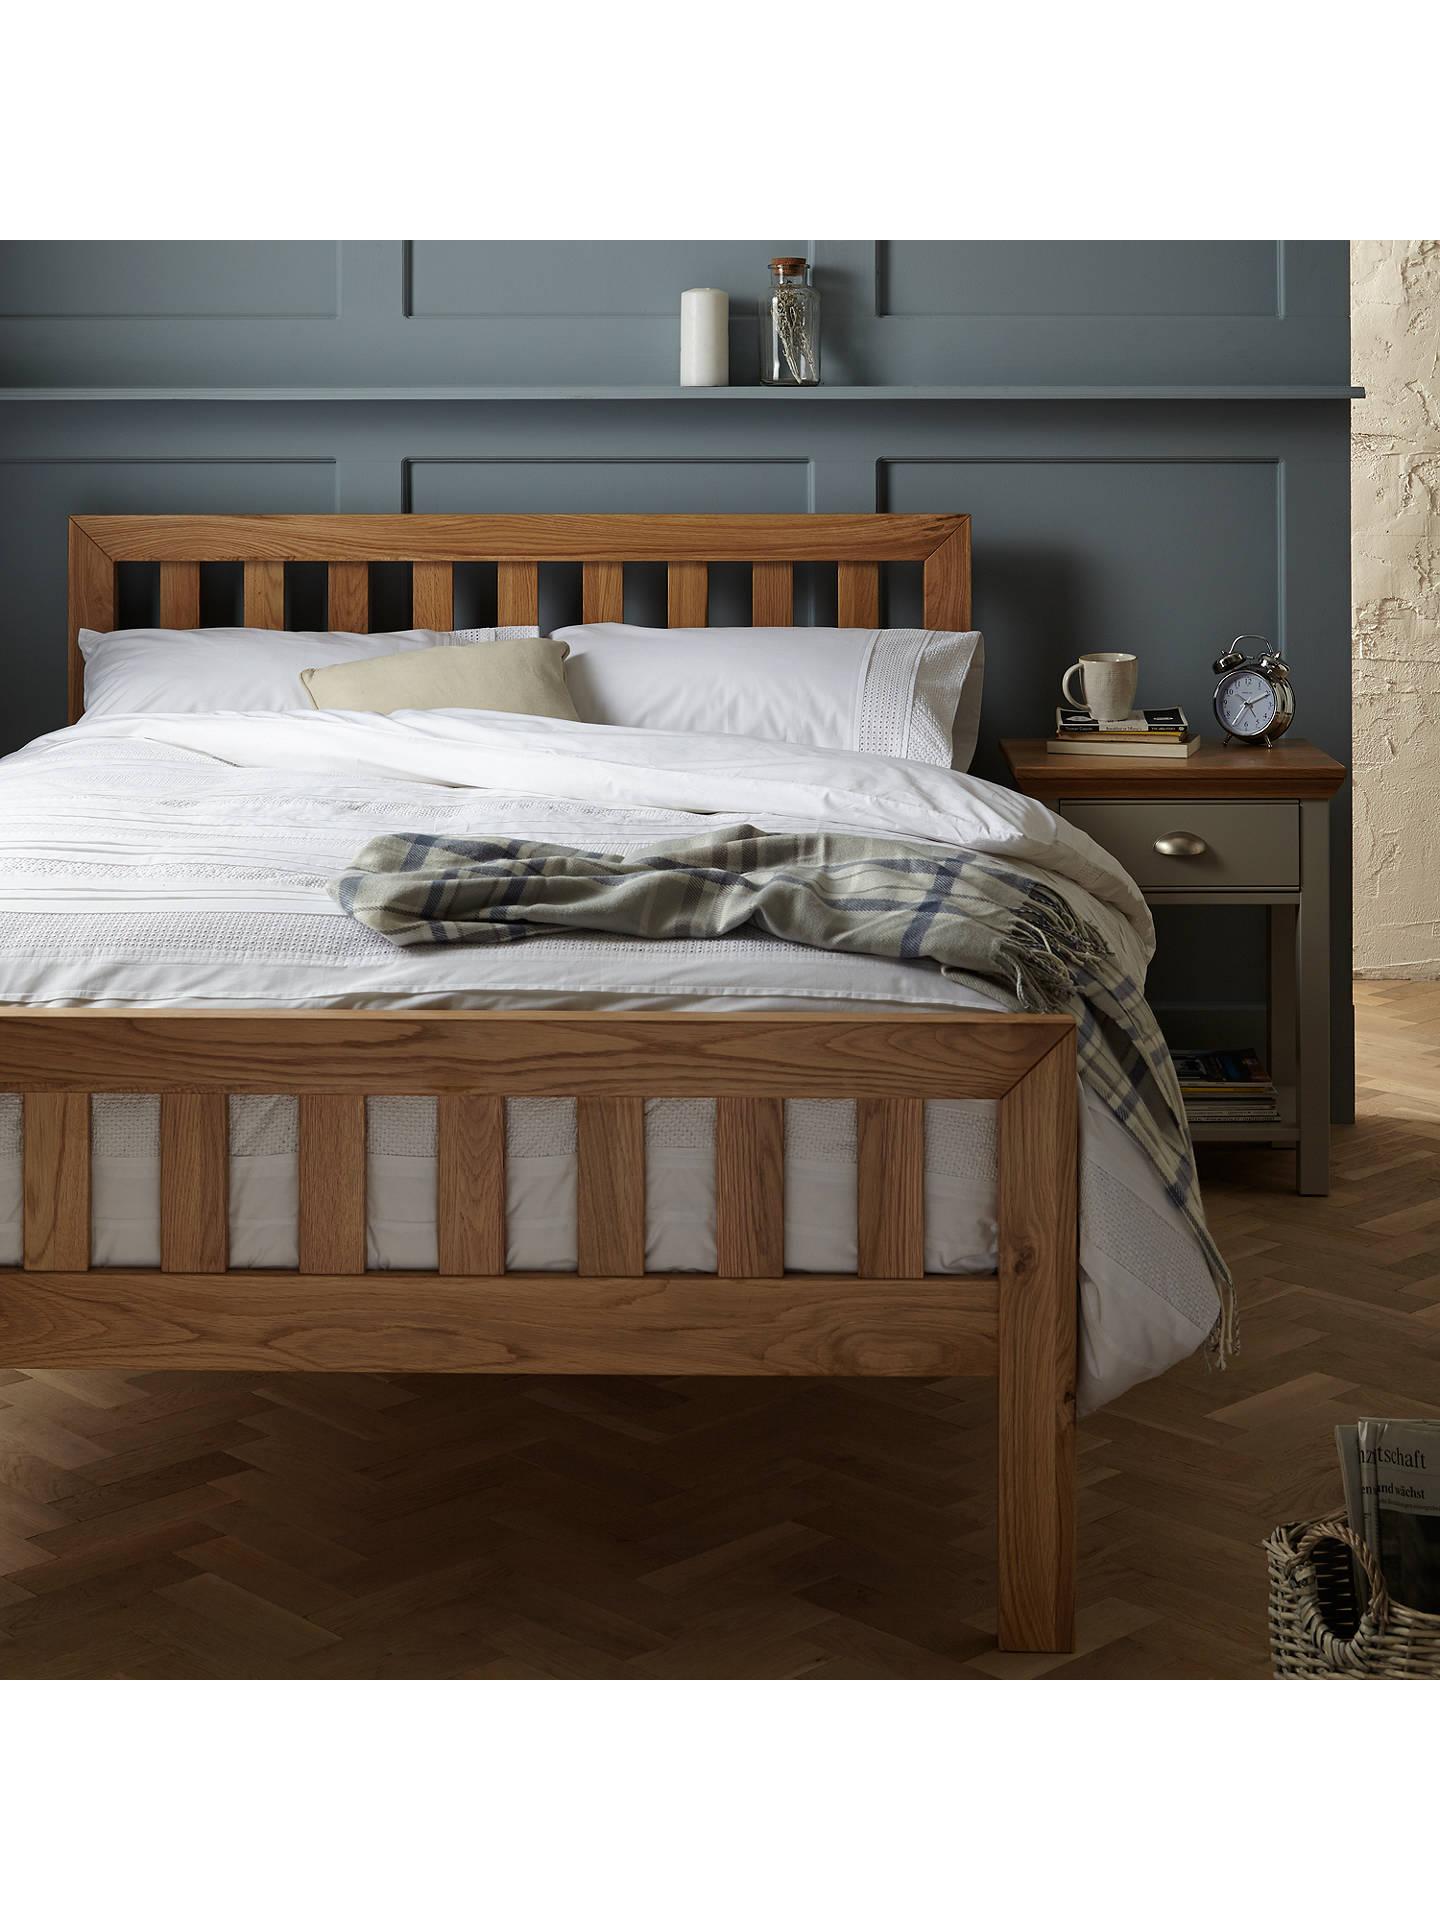 online retailer 3048e eb749 John Lewis & Partners Cooper Bed Frame, King Size, Oak